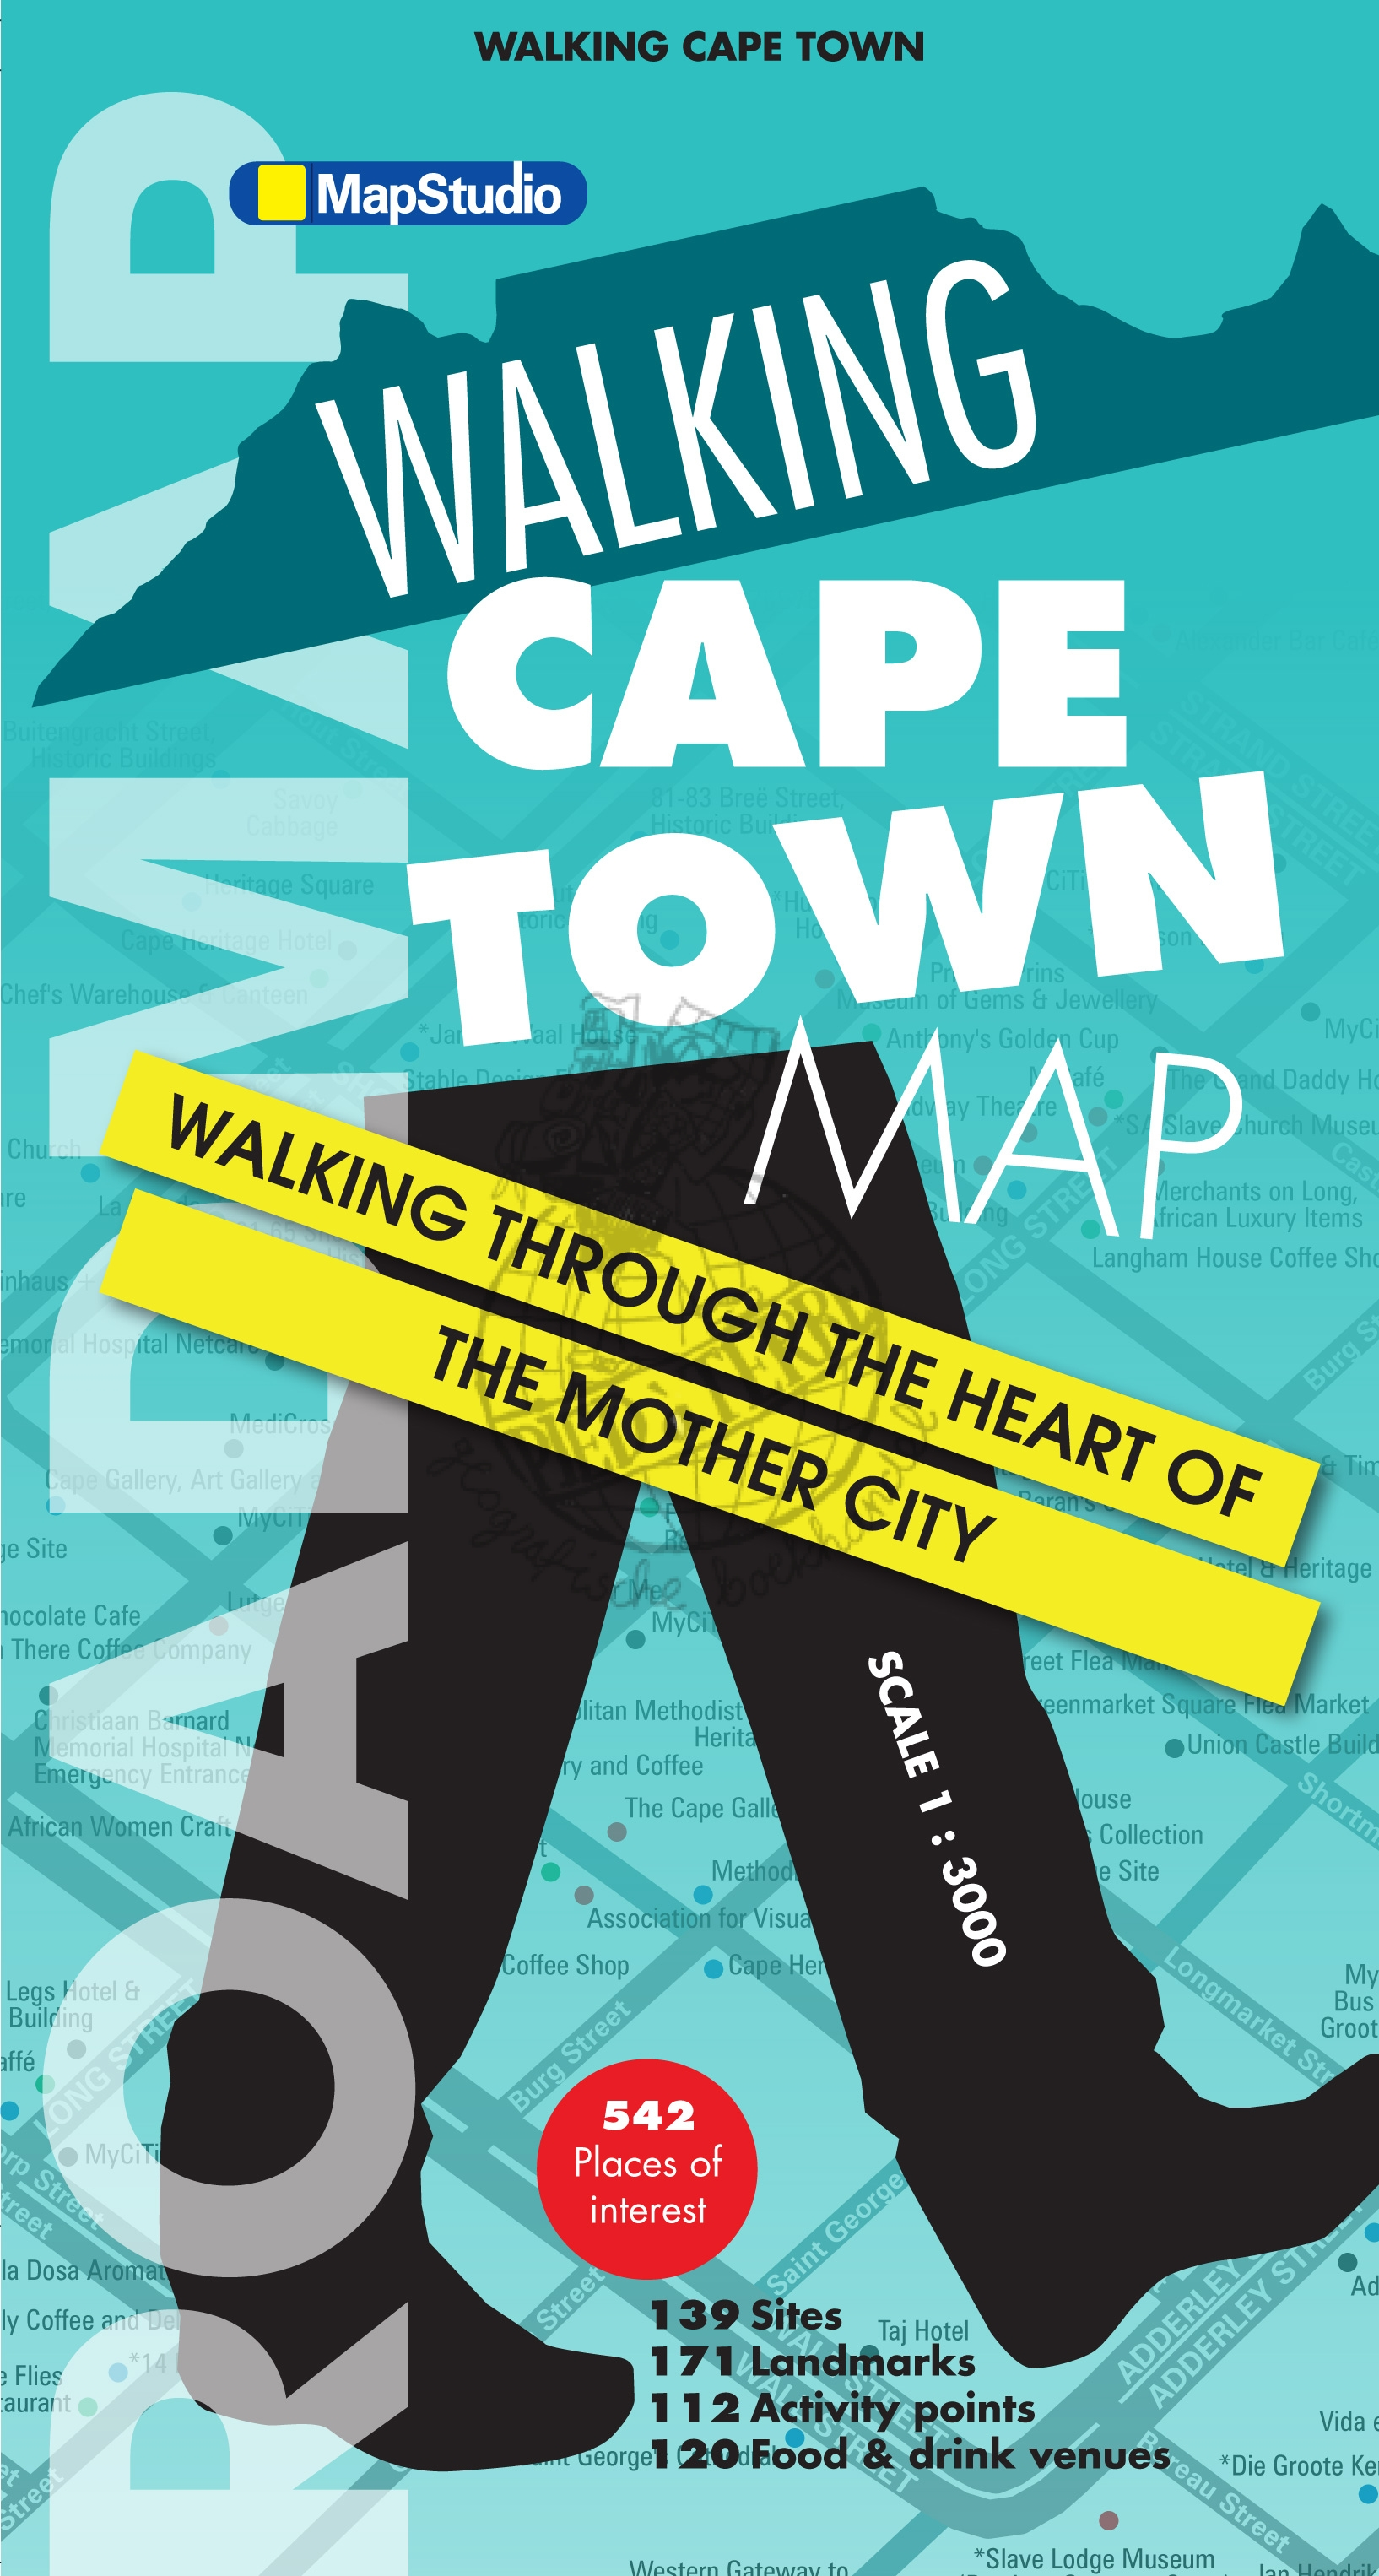 Kaapstad, wandelkaart 9781770268340  Map Studio   Stadsplattegronden Zuid-Afrika